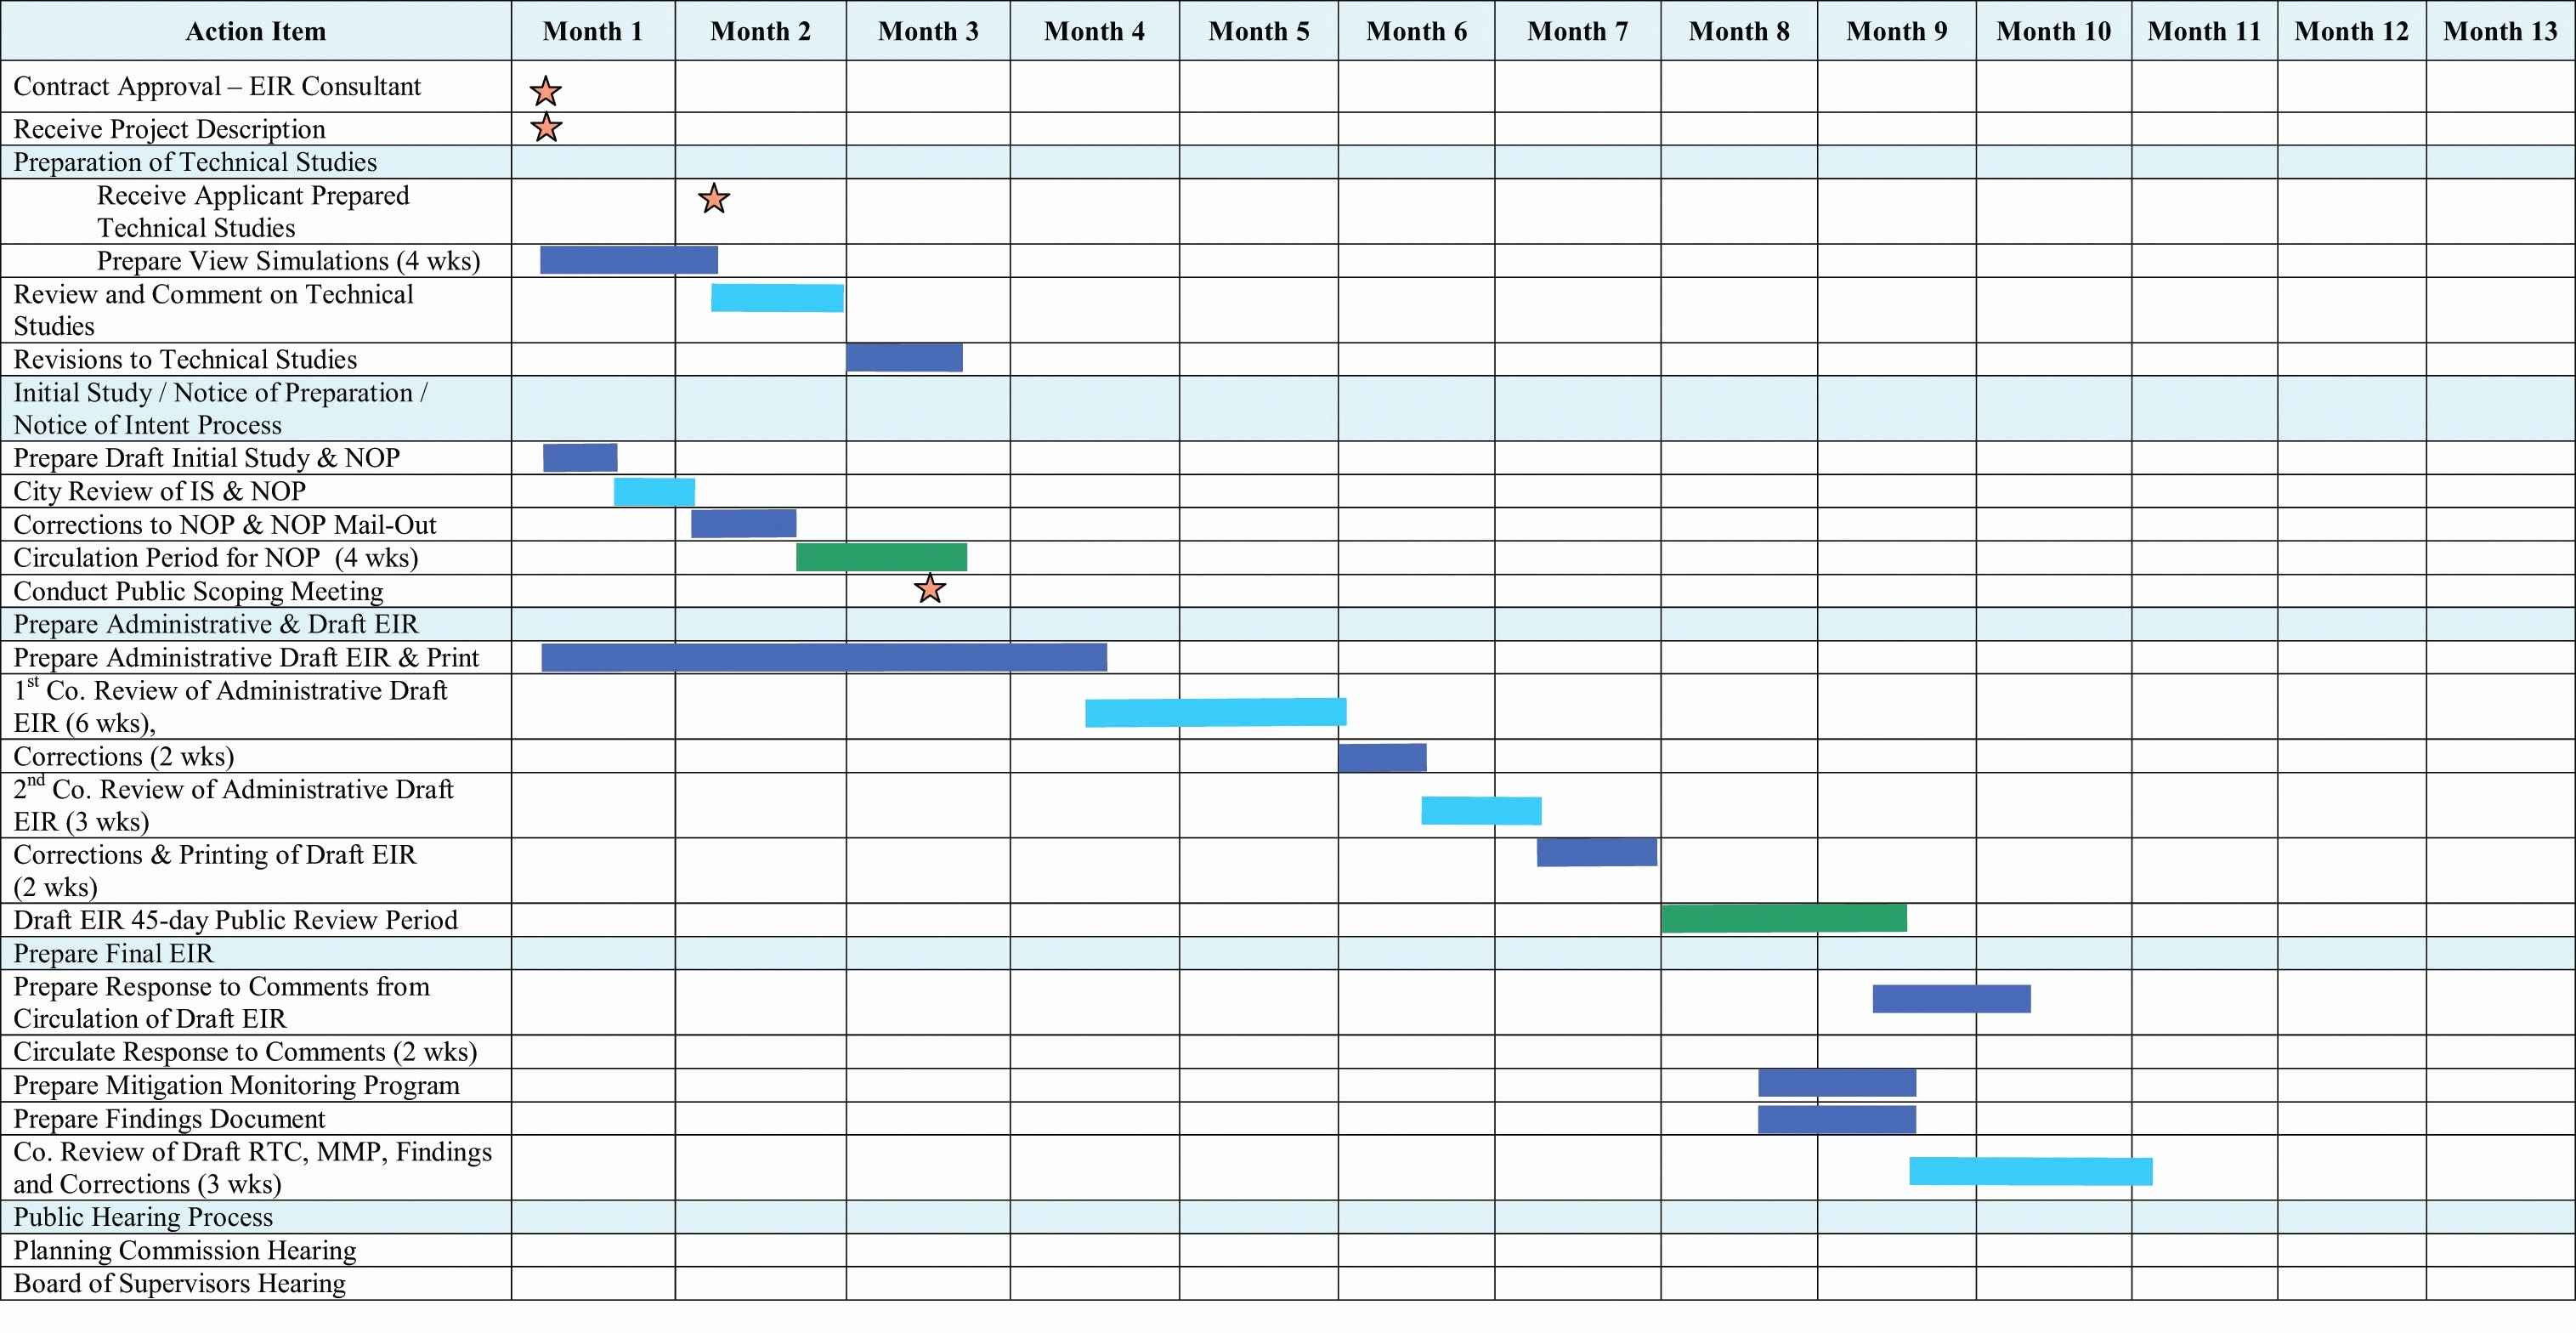 Gantt Diagramm Excel Vorlage Dann Excel Chart Templates With Create Inside Gantt Chart Template Excel 2010 Free